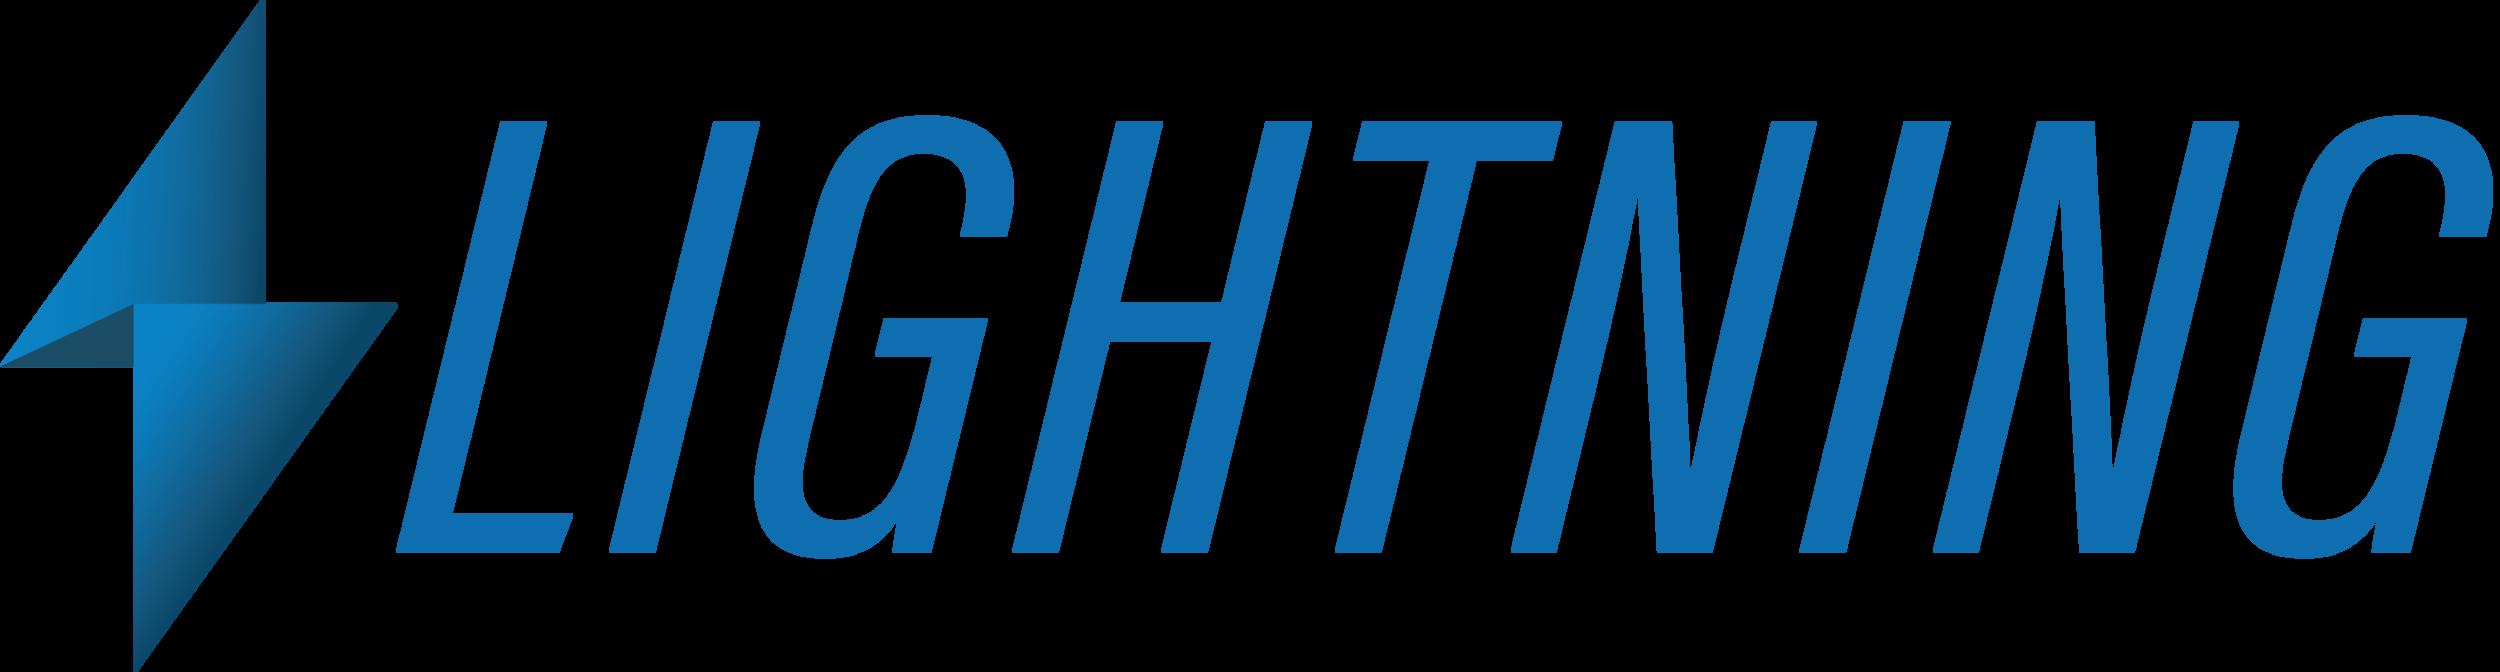 Lightning alignment sheet generation software in arc gis